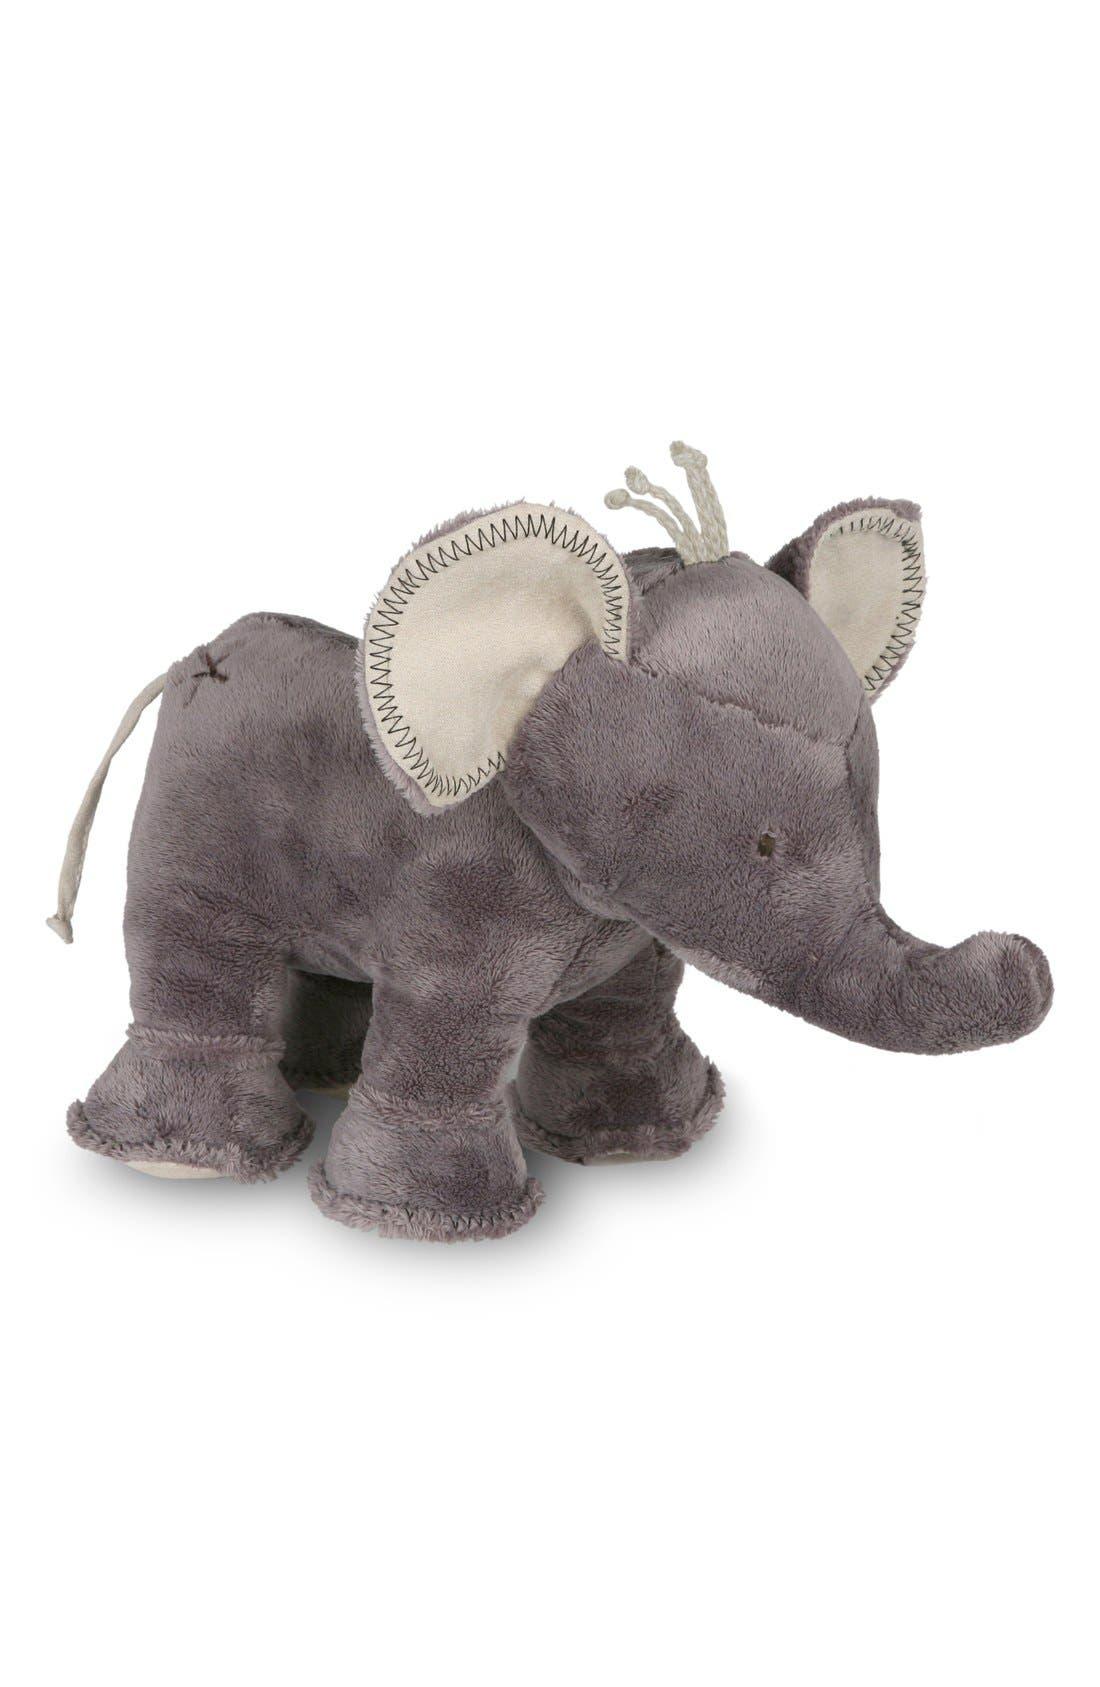 'Buddy the Elephant' Stuffed Animal,                             Alternate thumbnail 3, color,                             020